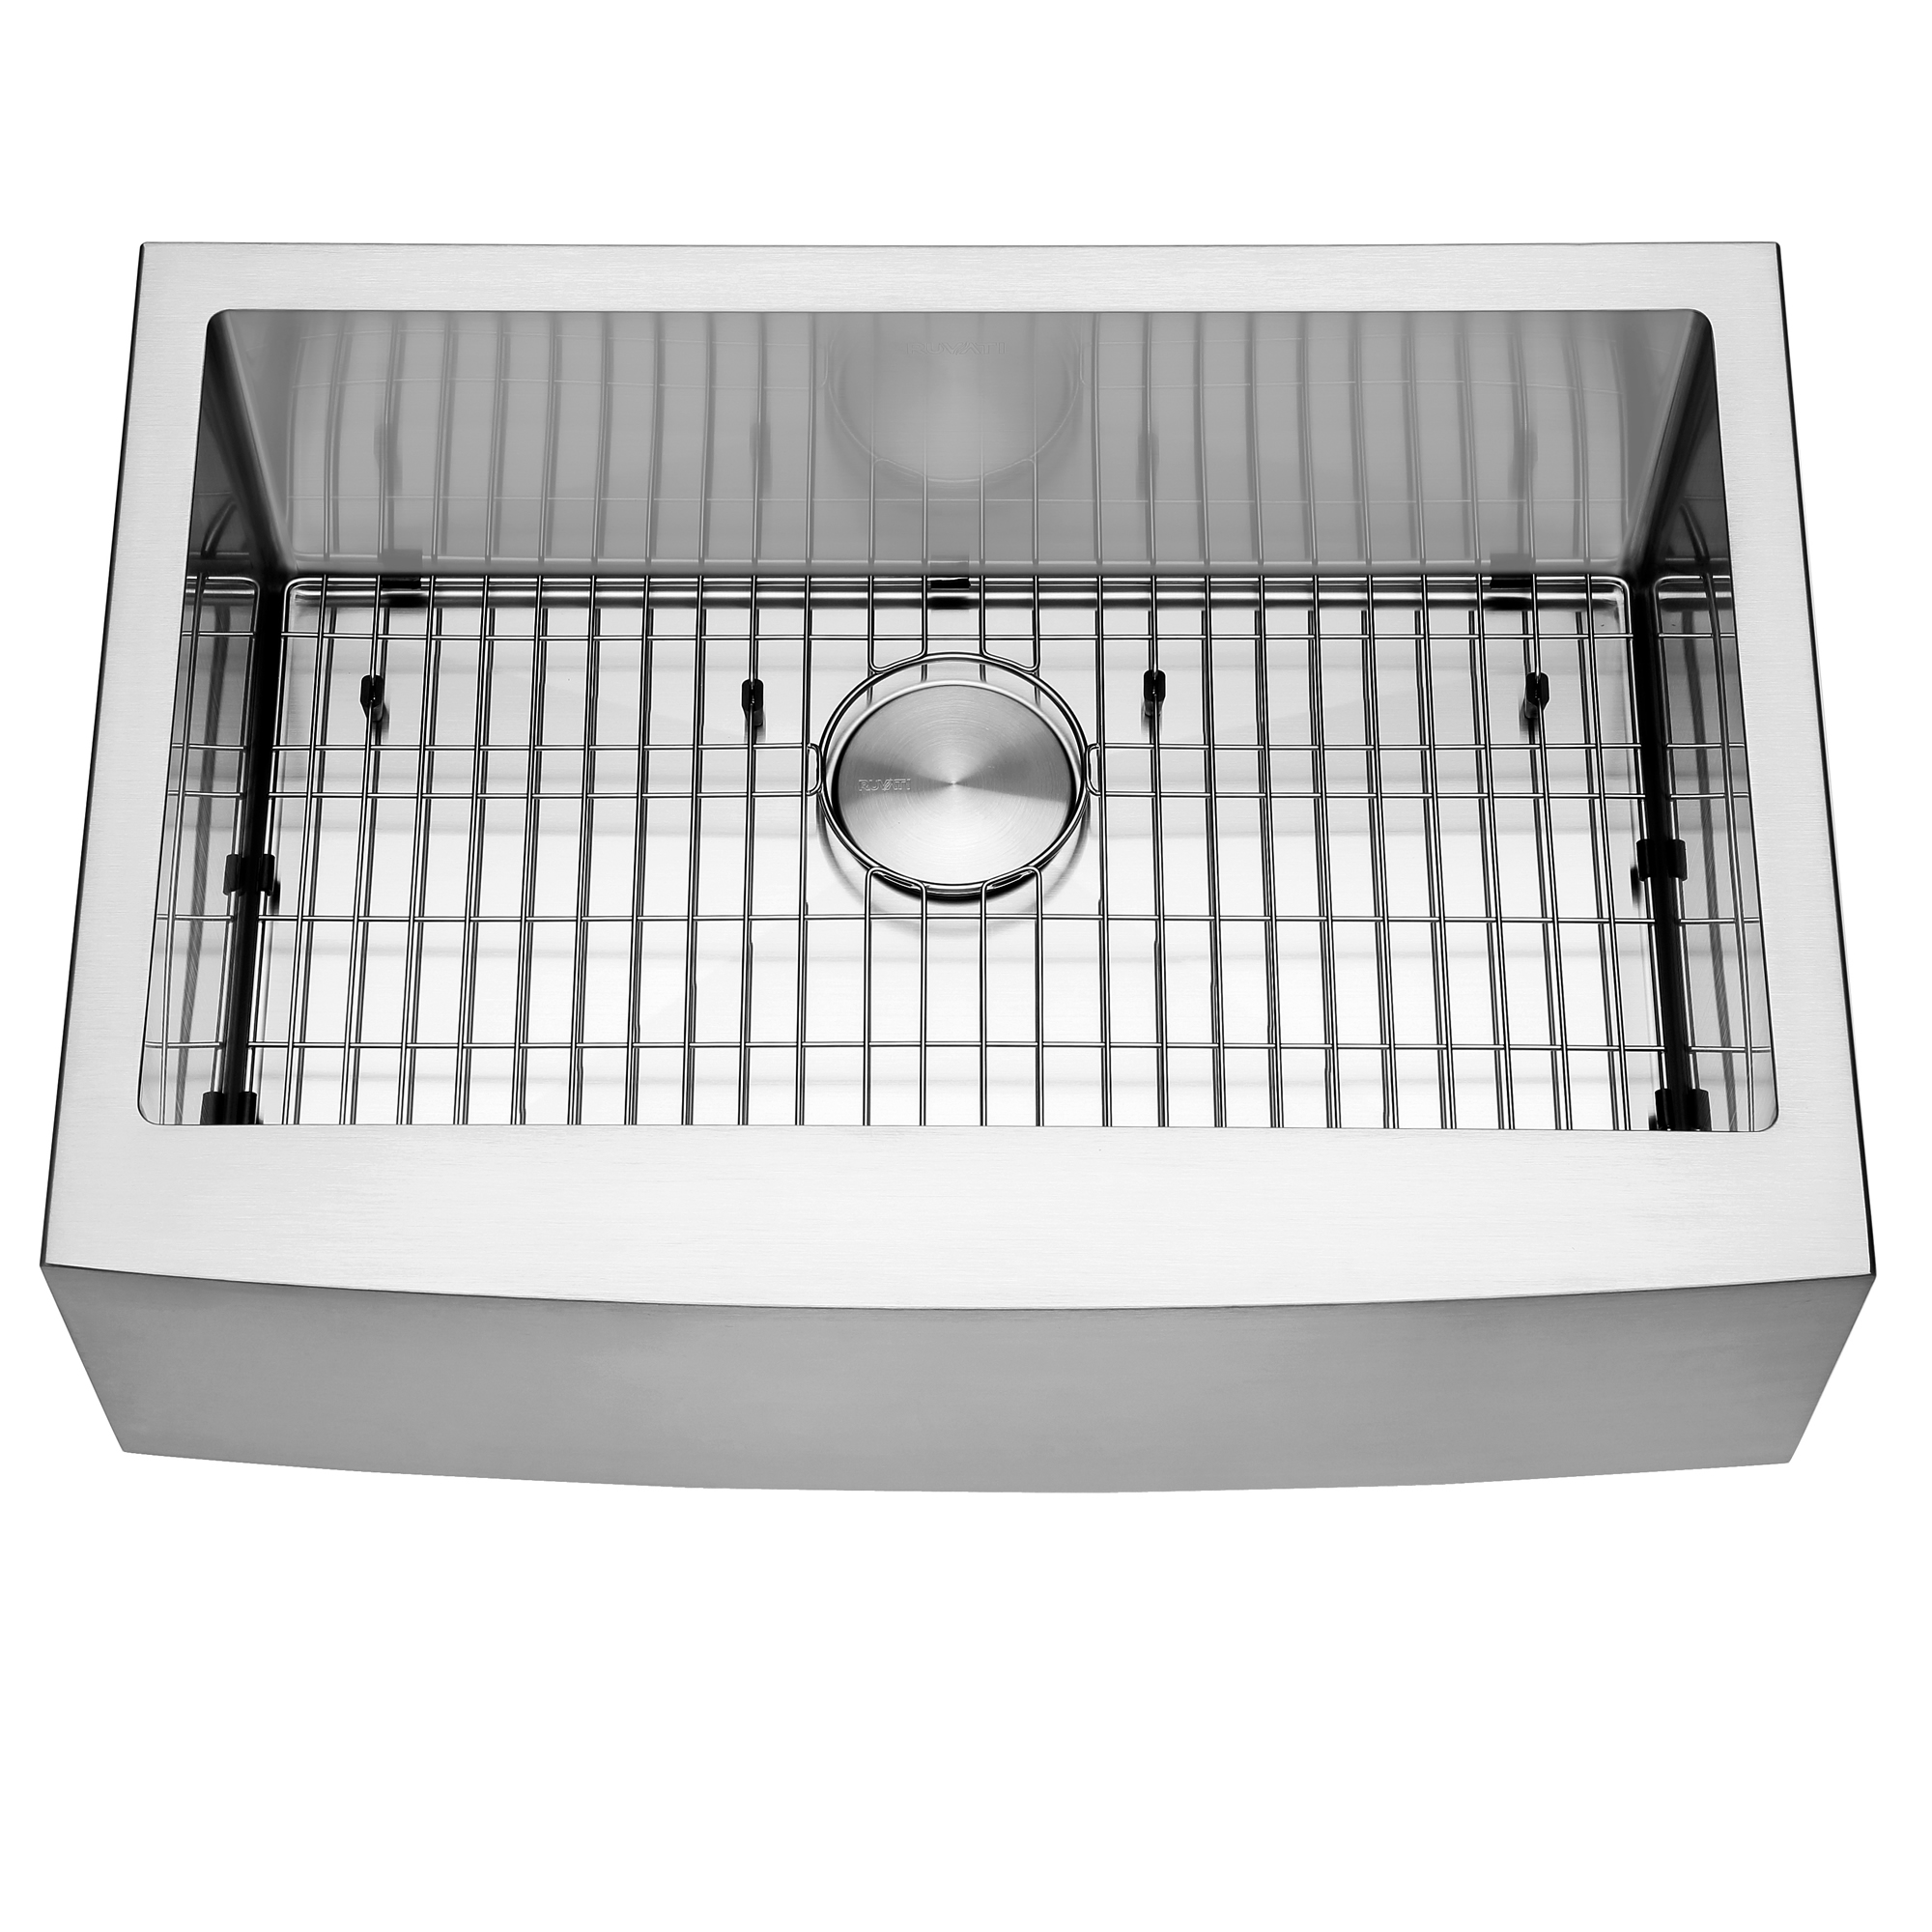 30 Inch Farmhouse Apron Front Kitchen Sink Stainless Steel Single Bowl Ruvati Usa